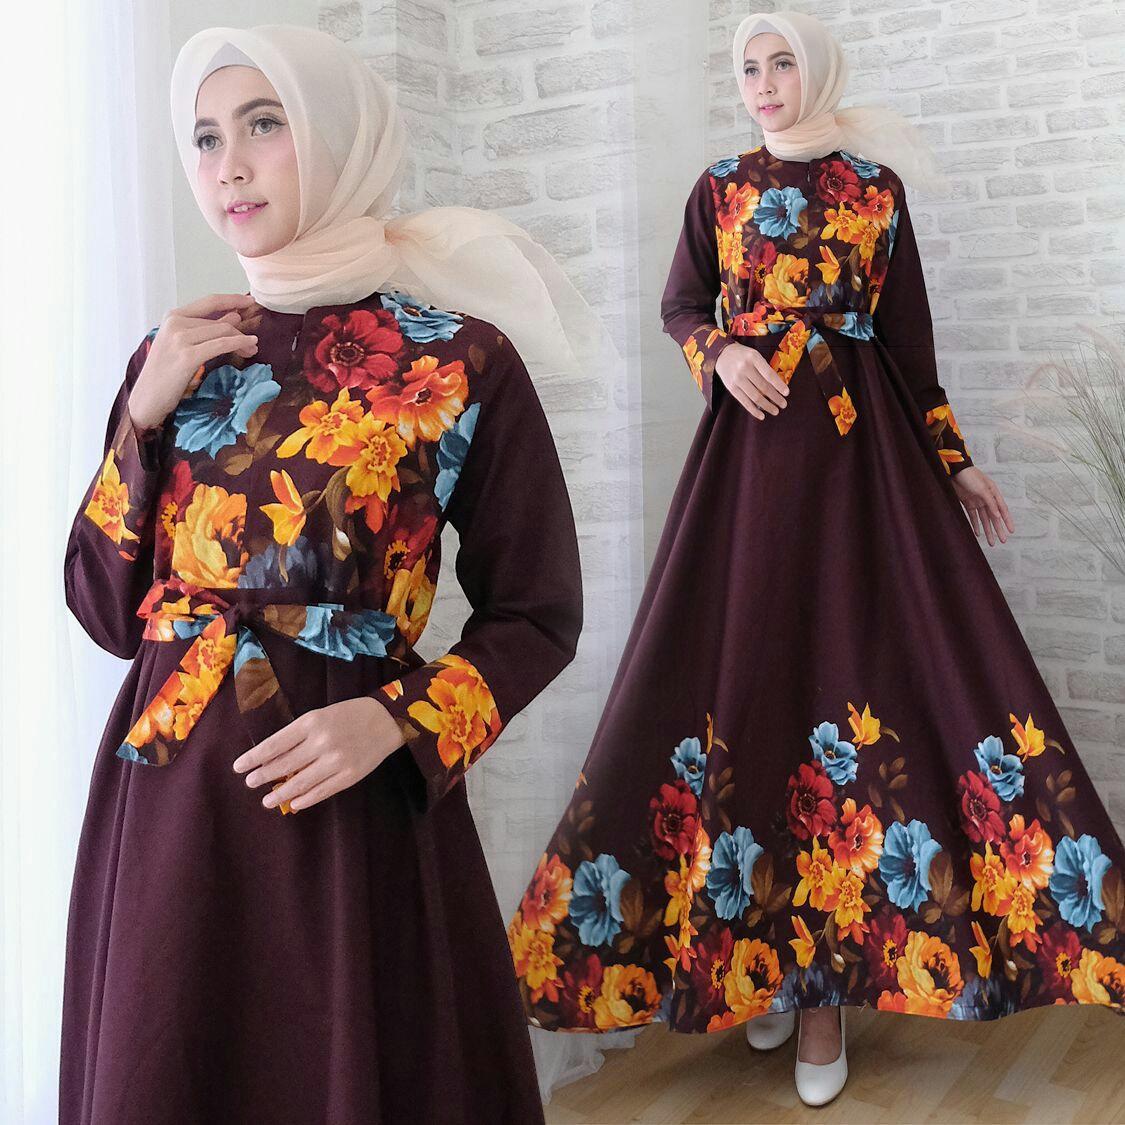 Snowshop Gamis Syari Viona - Baju Muslim / Fashion Wanita / Baju wanita / Baju Gamis / Busui / Gaun / Katun Paris / XL / Jumbo / Syari